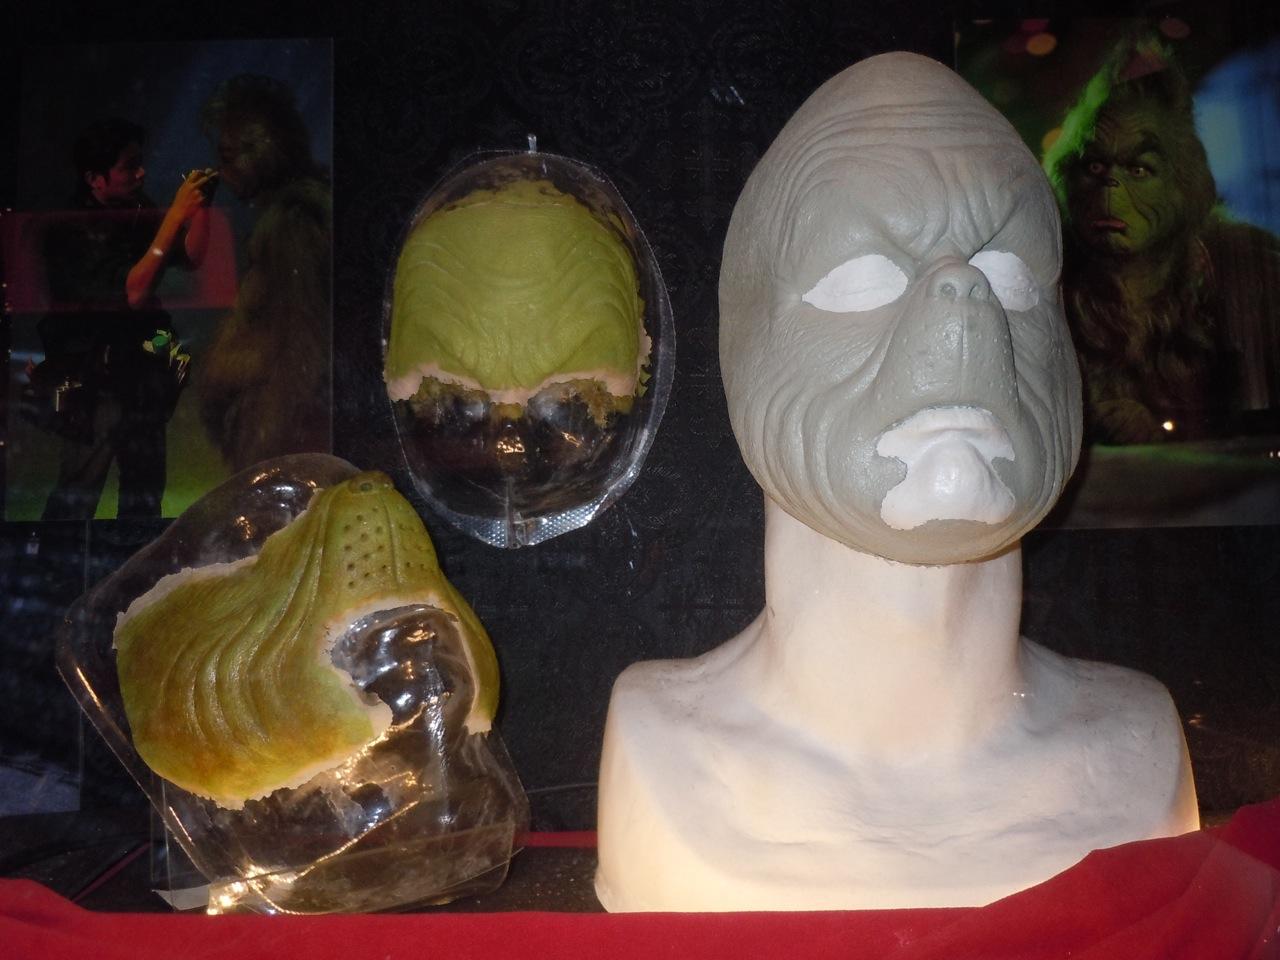 http://3.bp.blogspot.com/_GIchwvJ-aNk/TL9uFjxDKWI/AAAAAAAAVto/Ij1CuddfkAQ/s1600/Jim+Carrey+Grinch+prosthetics.jpg